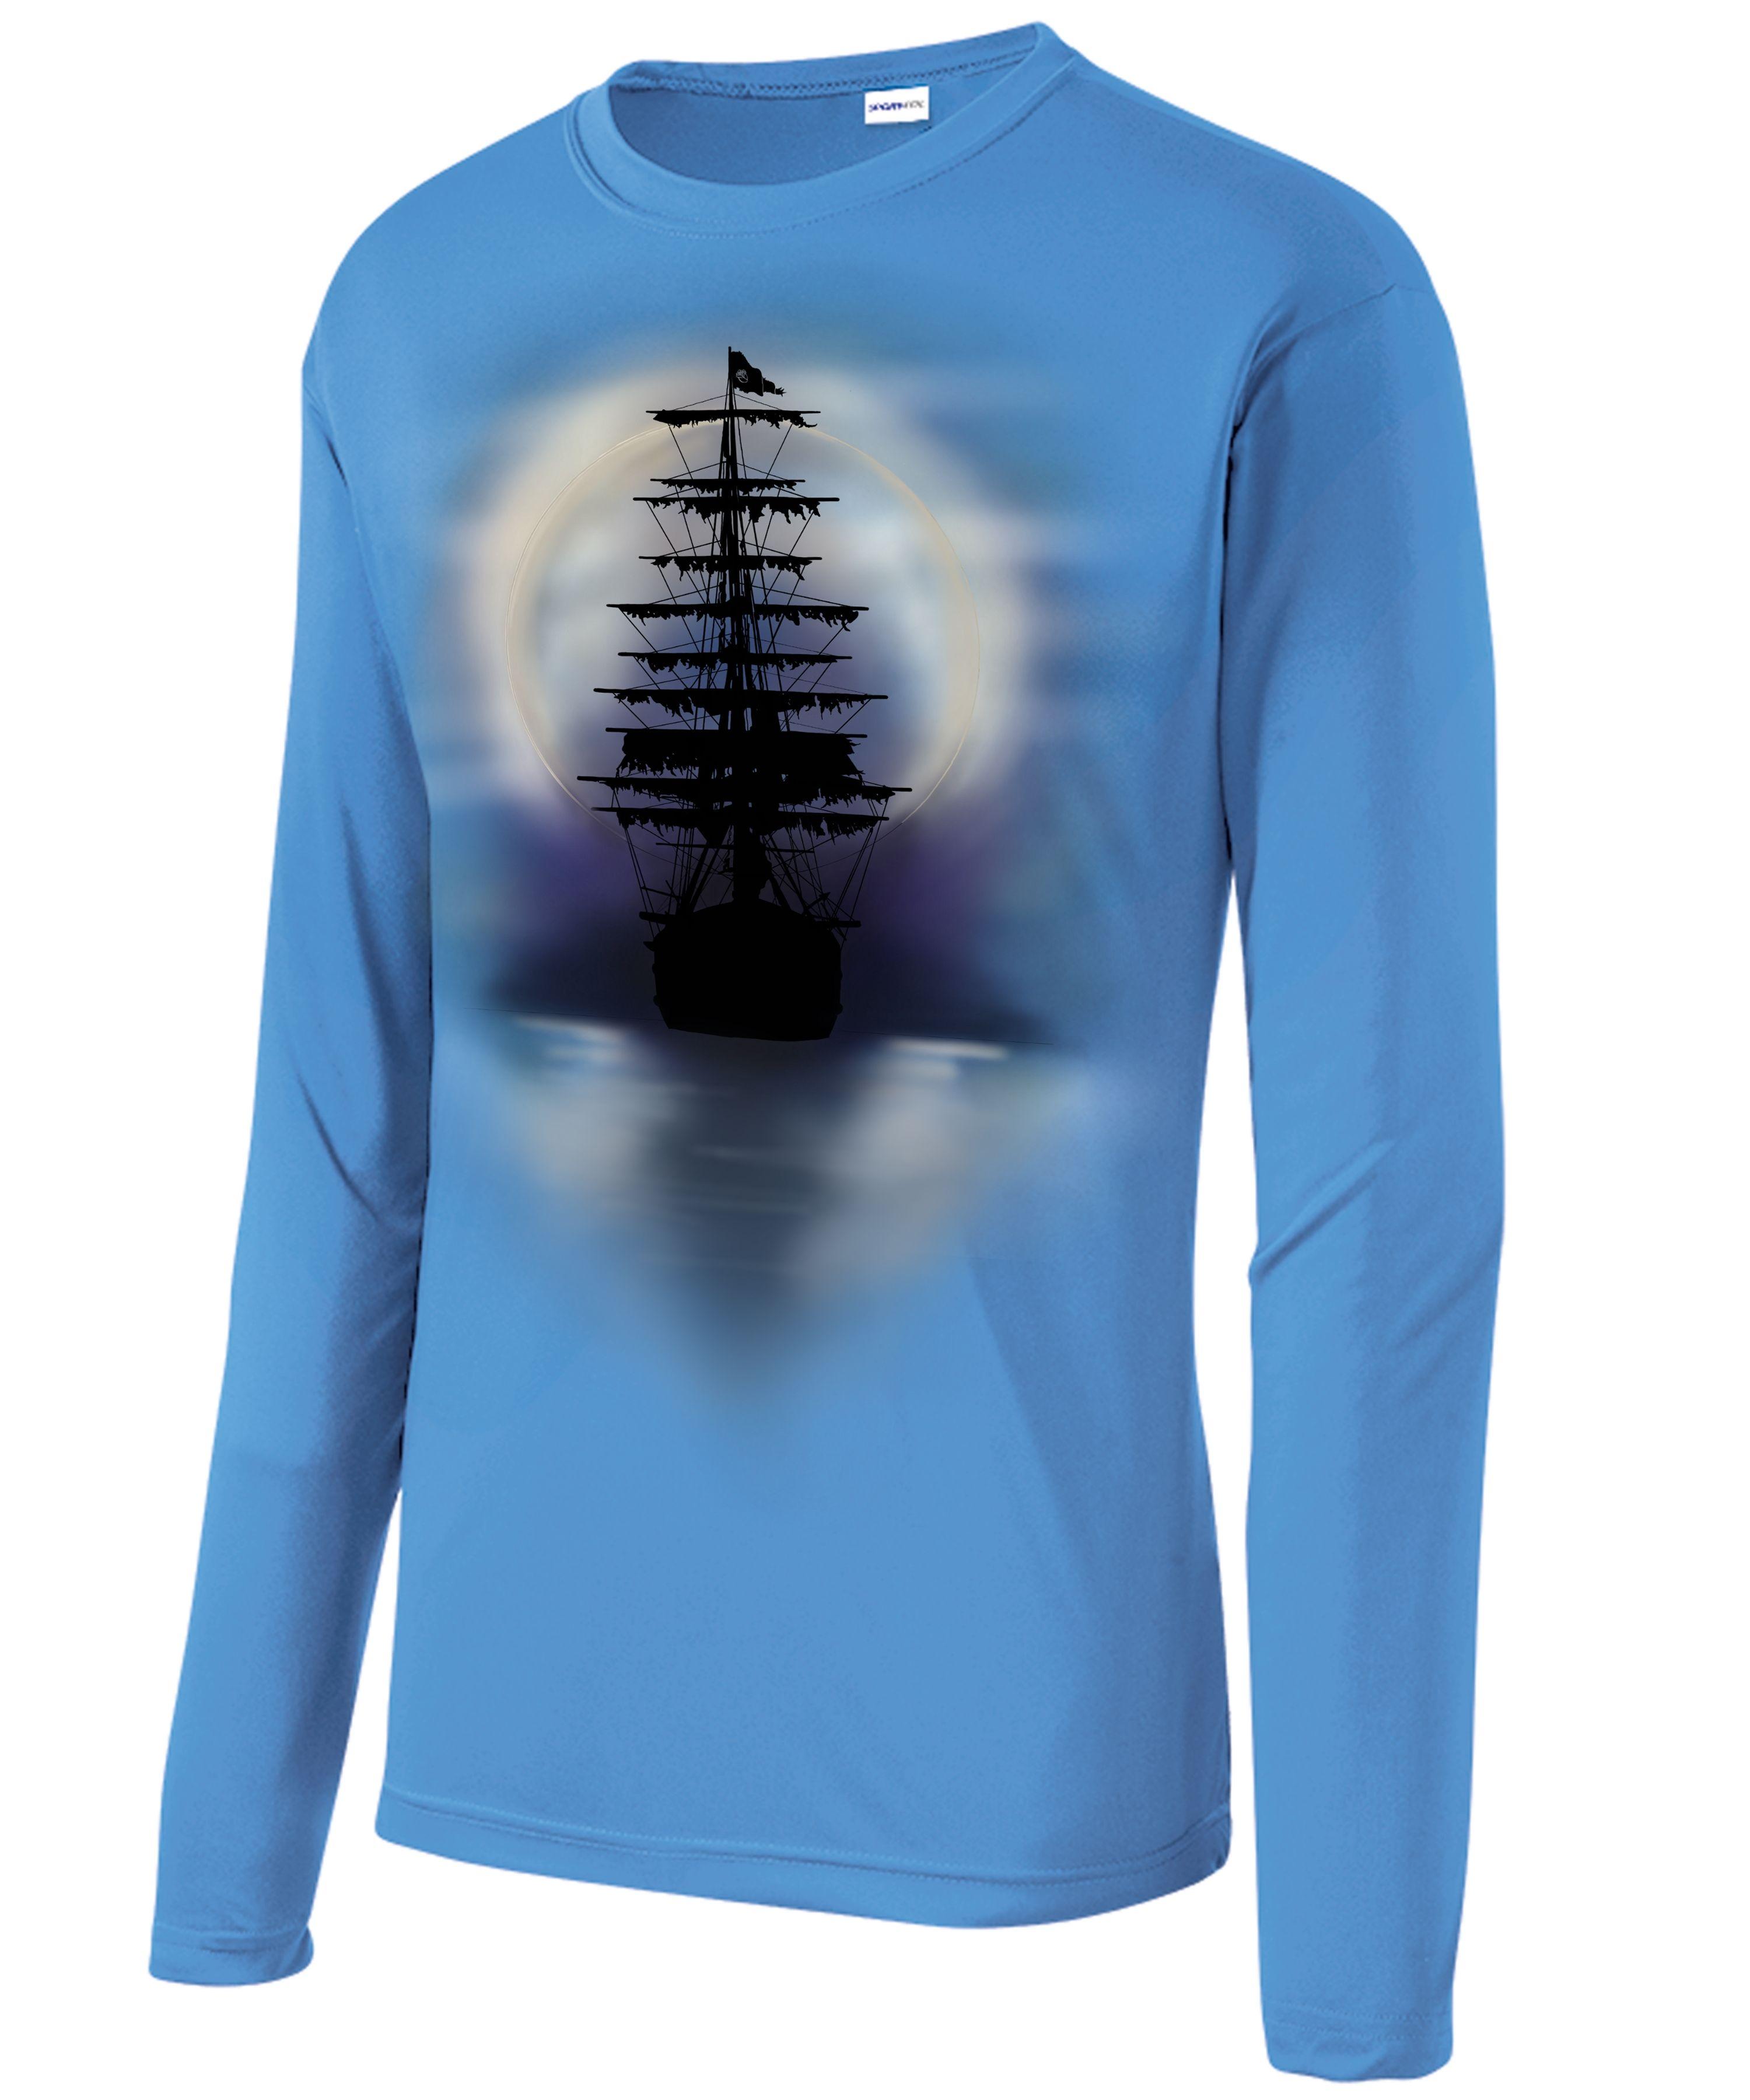 Custom Printed Long Sleeve Fishing Shirts Lauren Goss